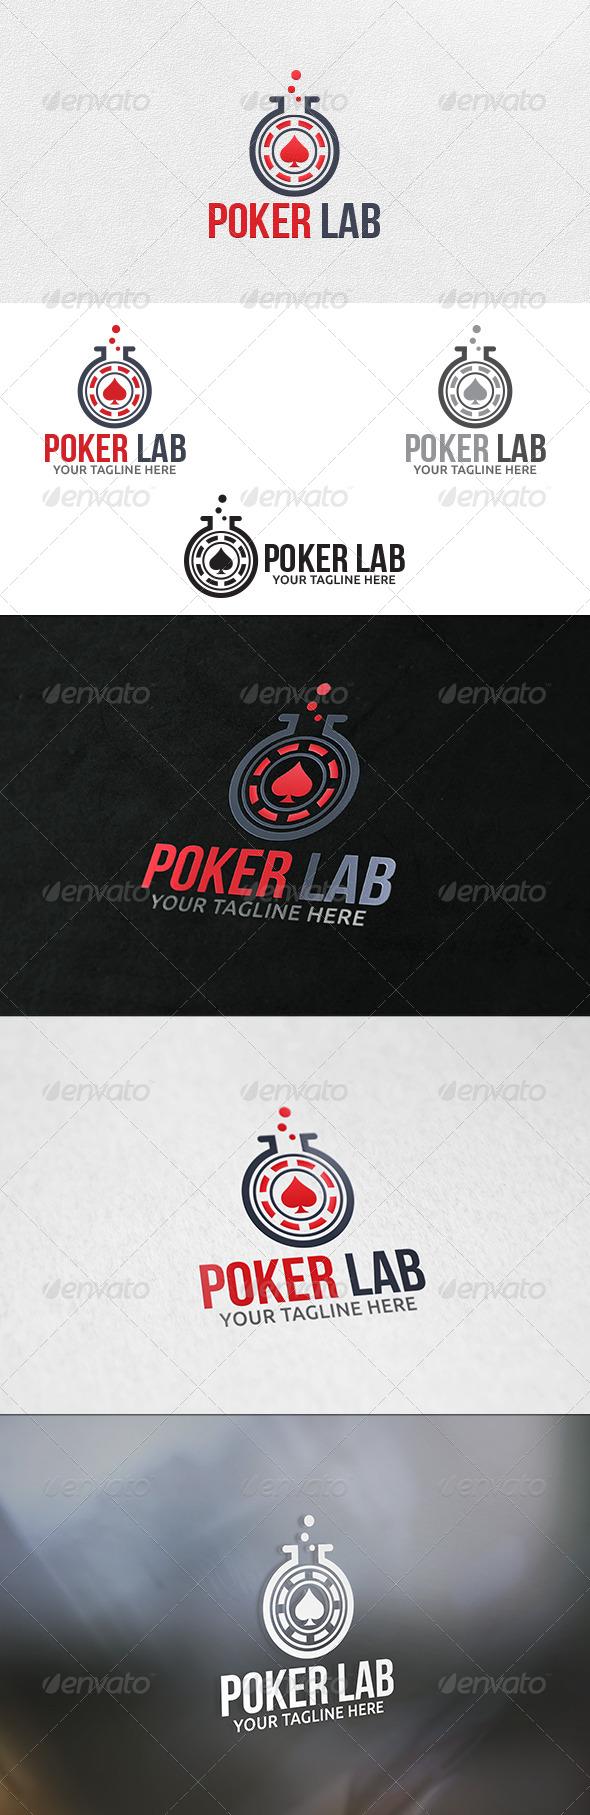 Poker Lab - Logo Template - Symbols Logo Templates